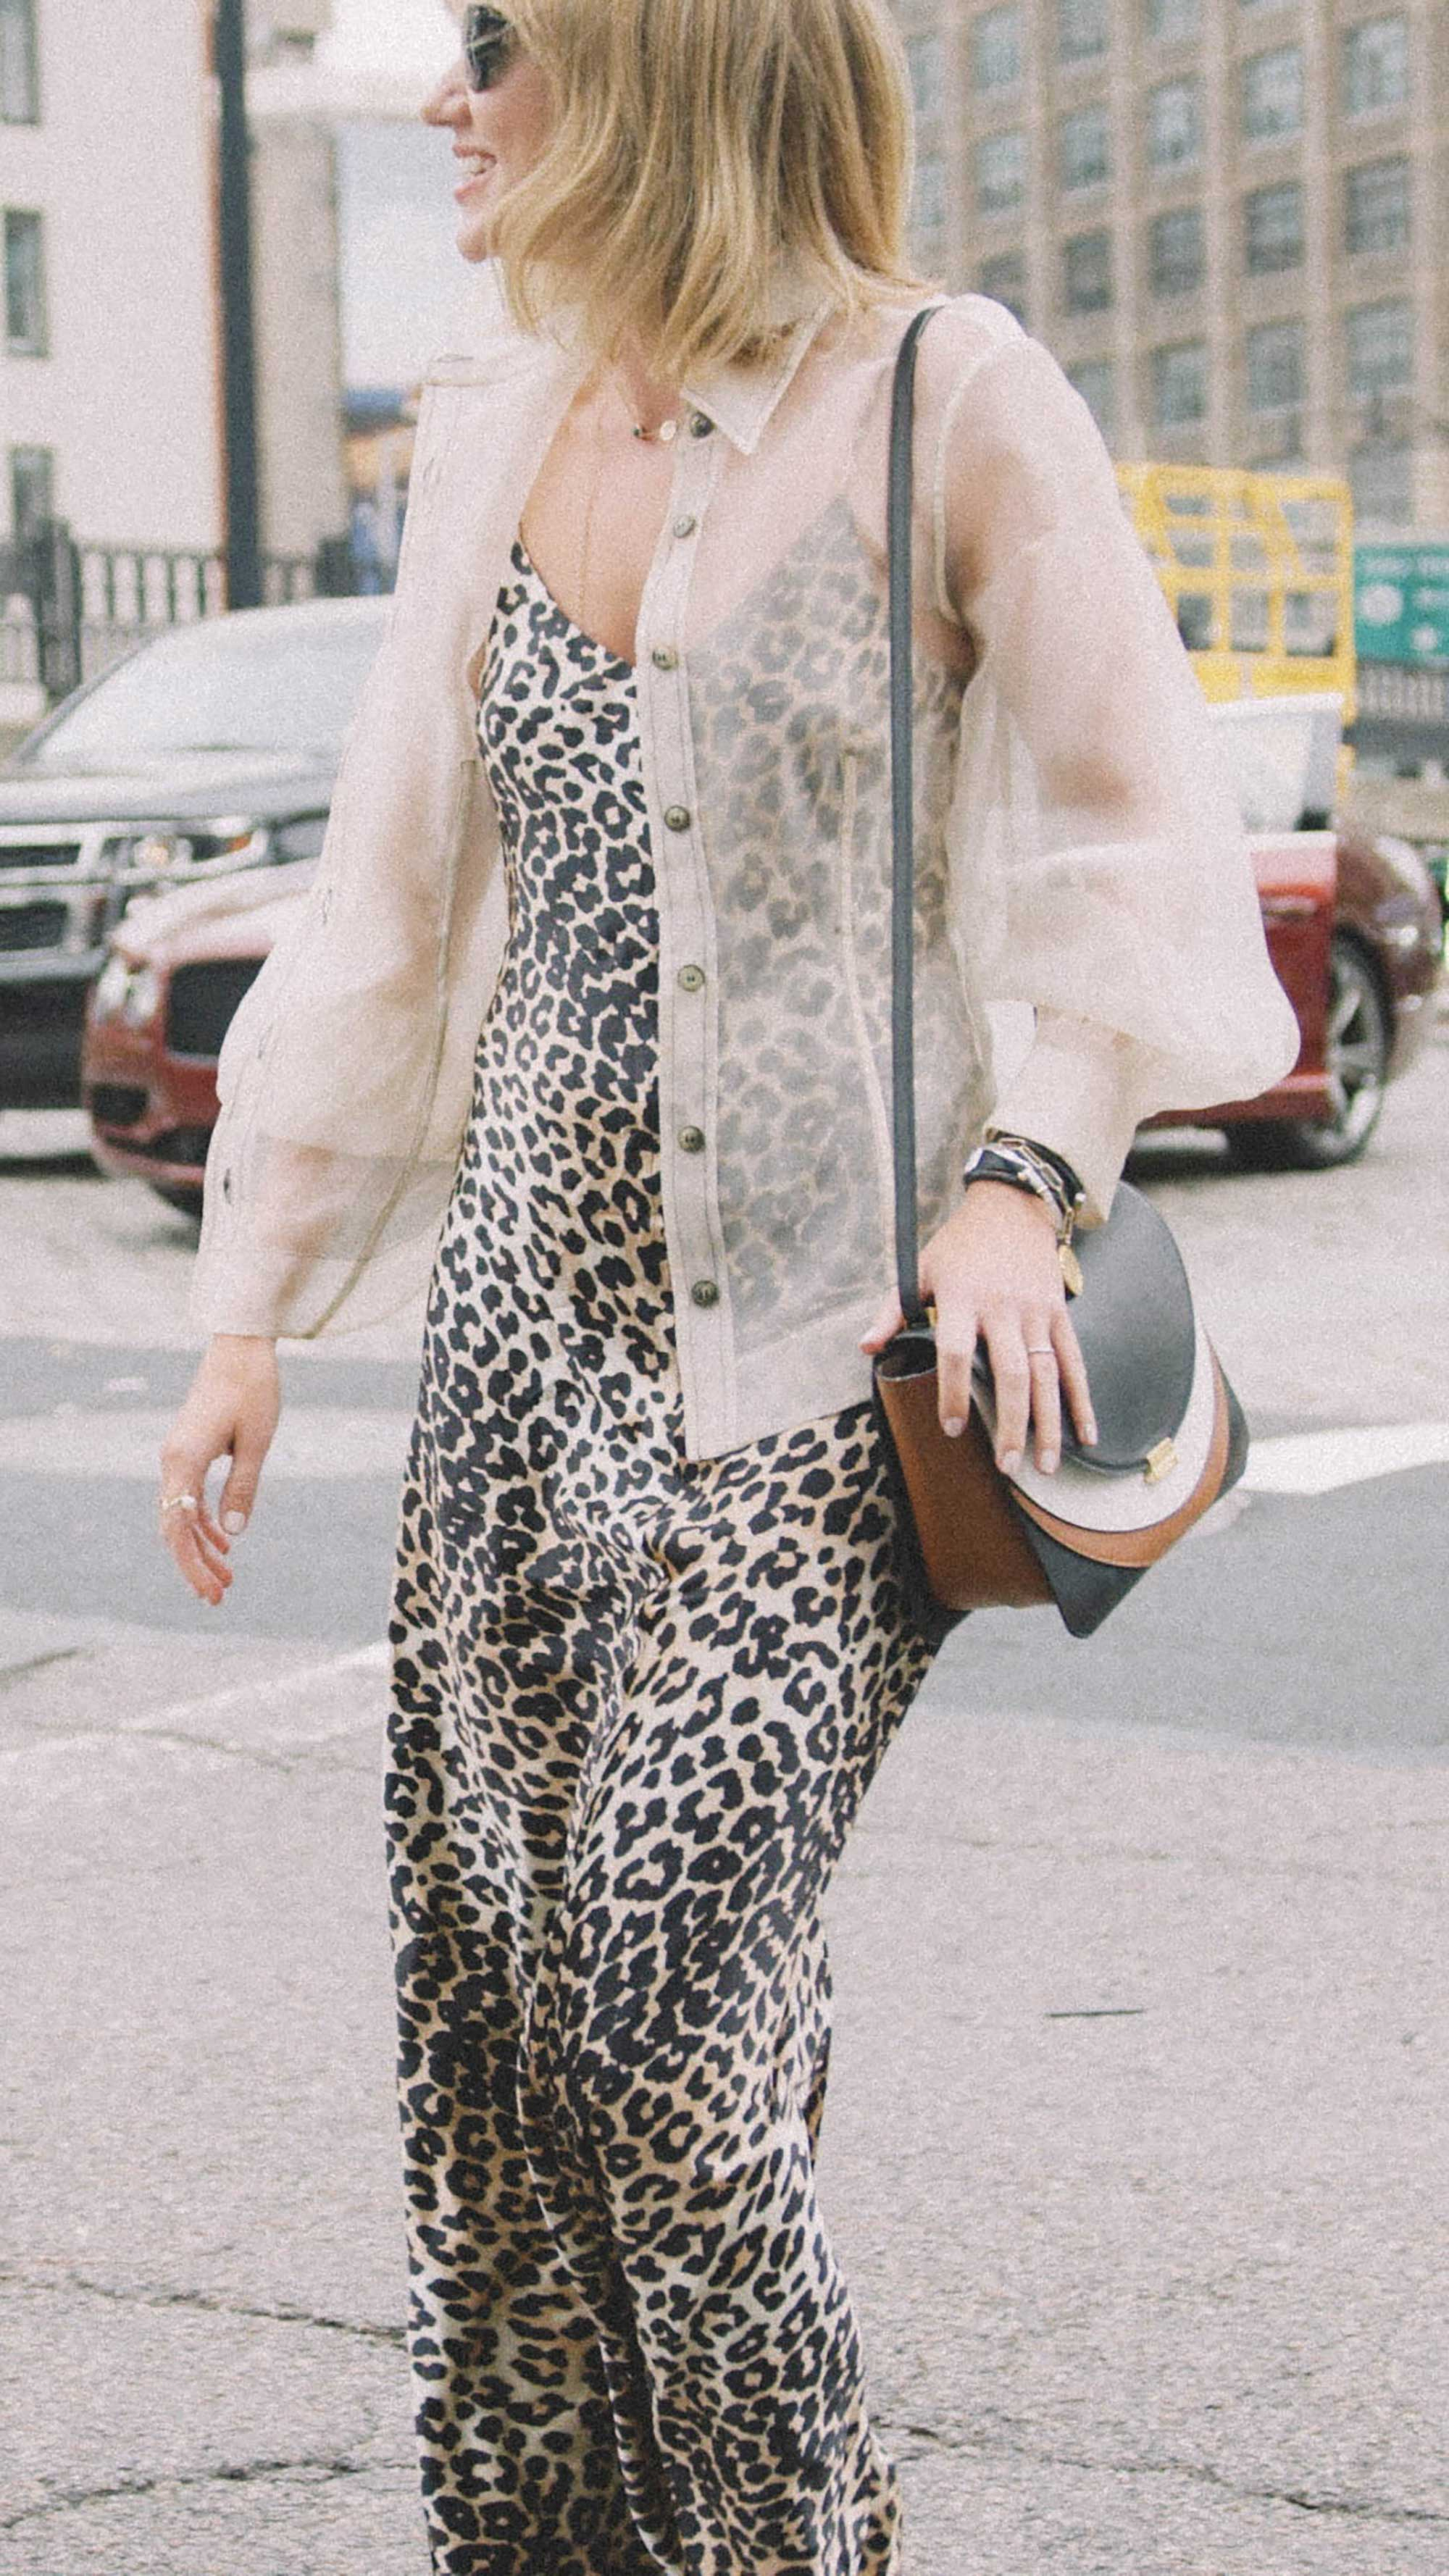 10 Easy Ways to Pull Off Animal Print, leaopard print slip dress, Lisa Aiken street style nyc.jpg